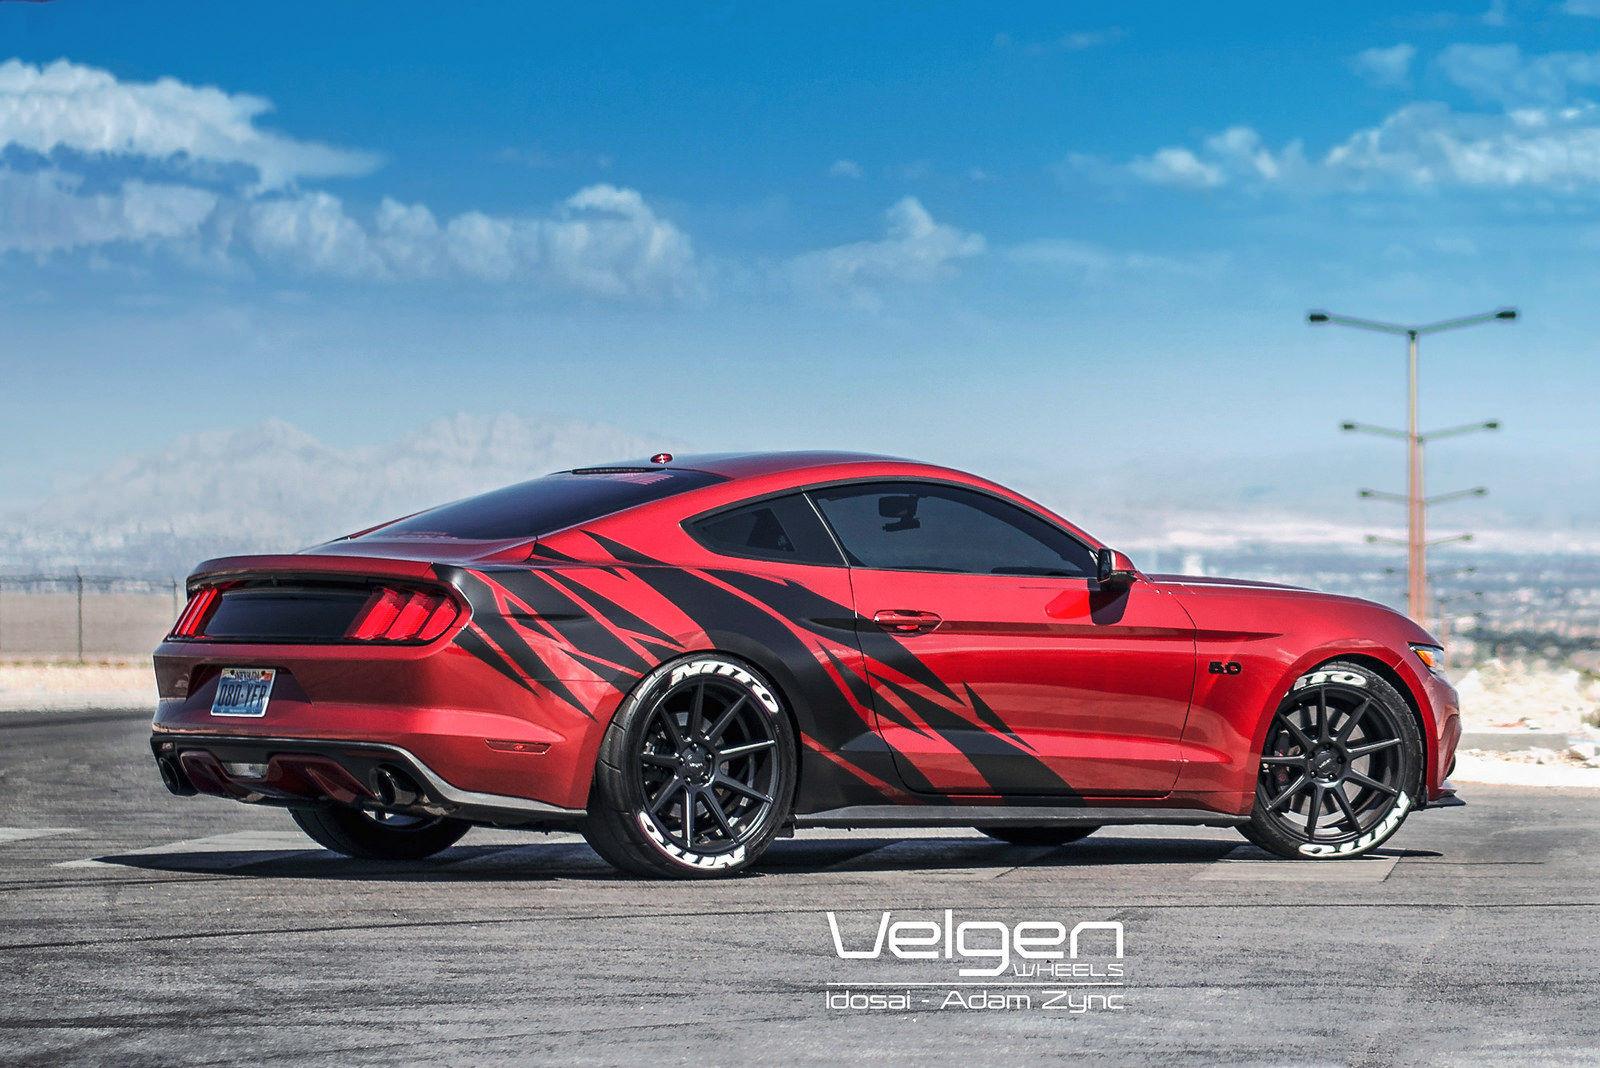 2015 Ford Mustang | 2015 Mustang Ruby Red on Velgen Wheels VMB9